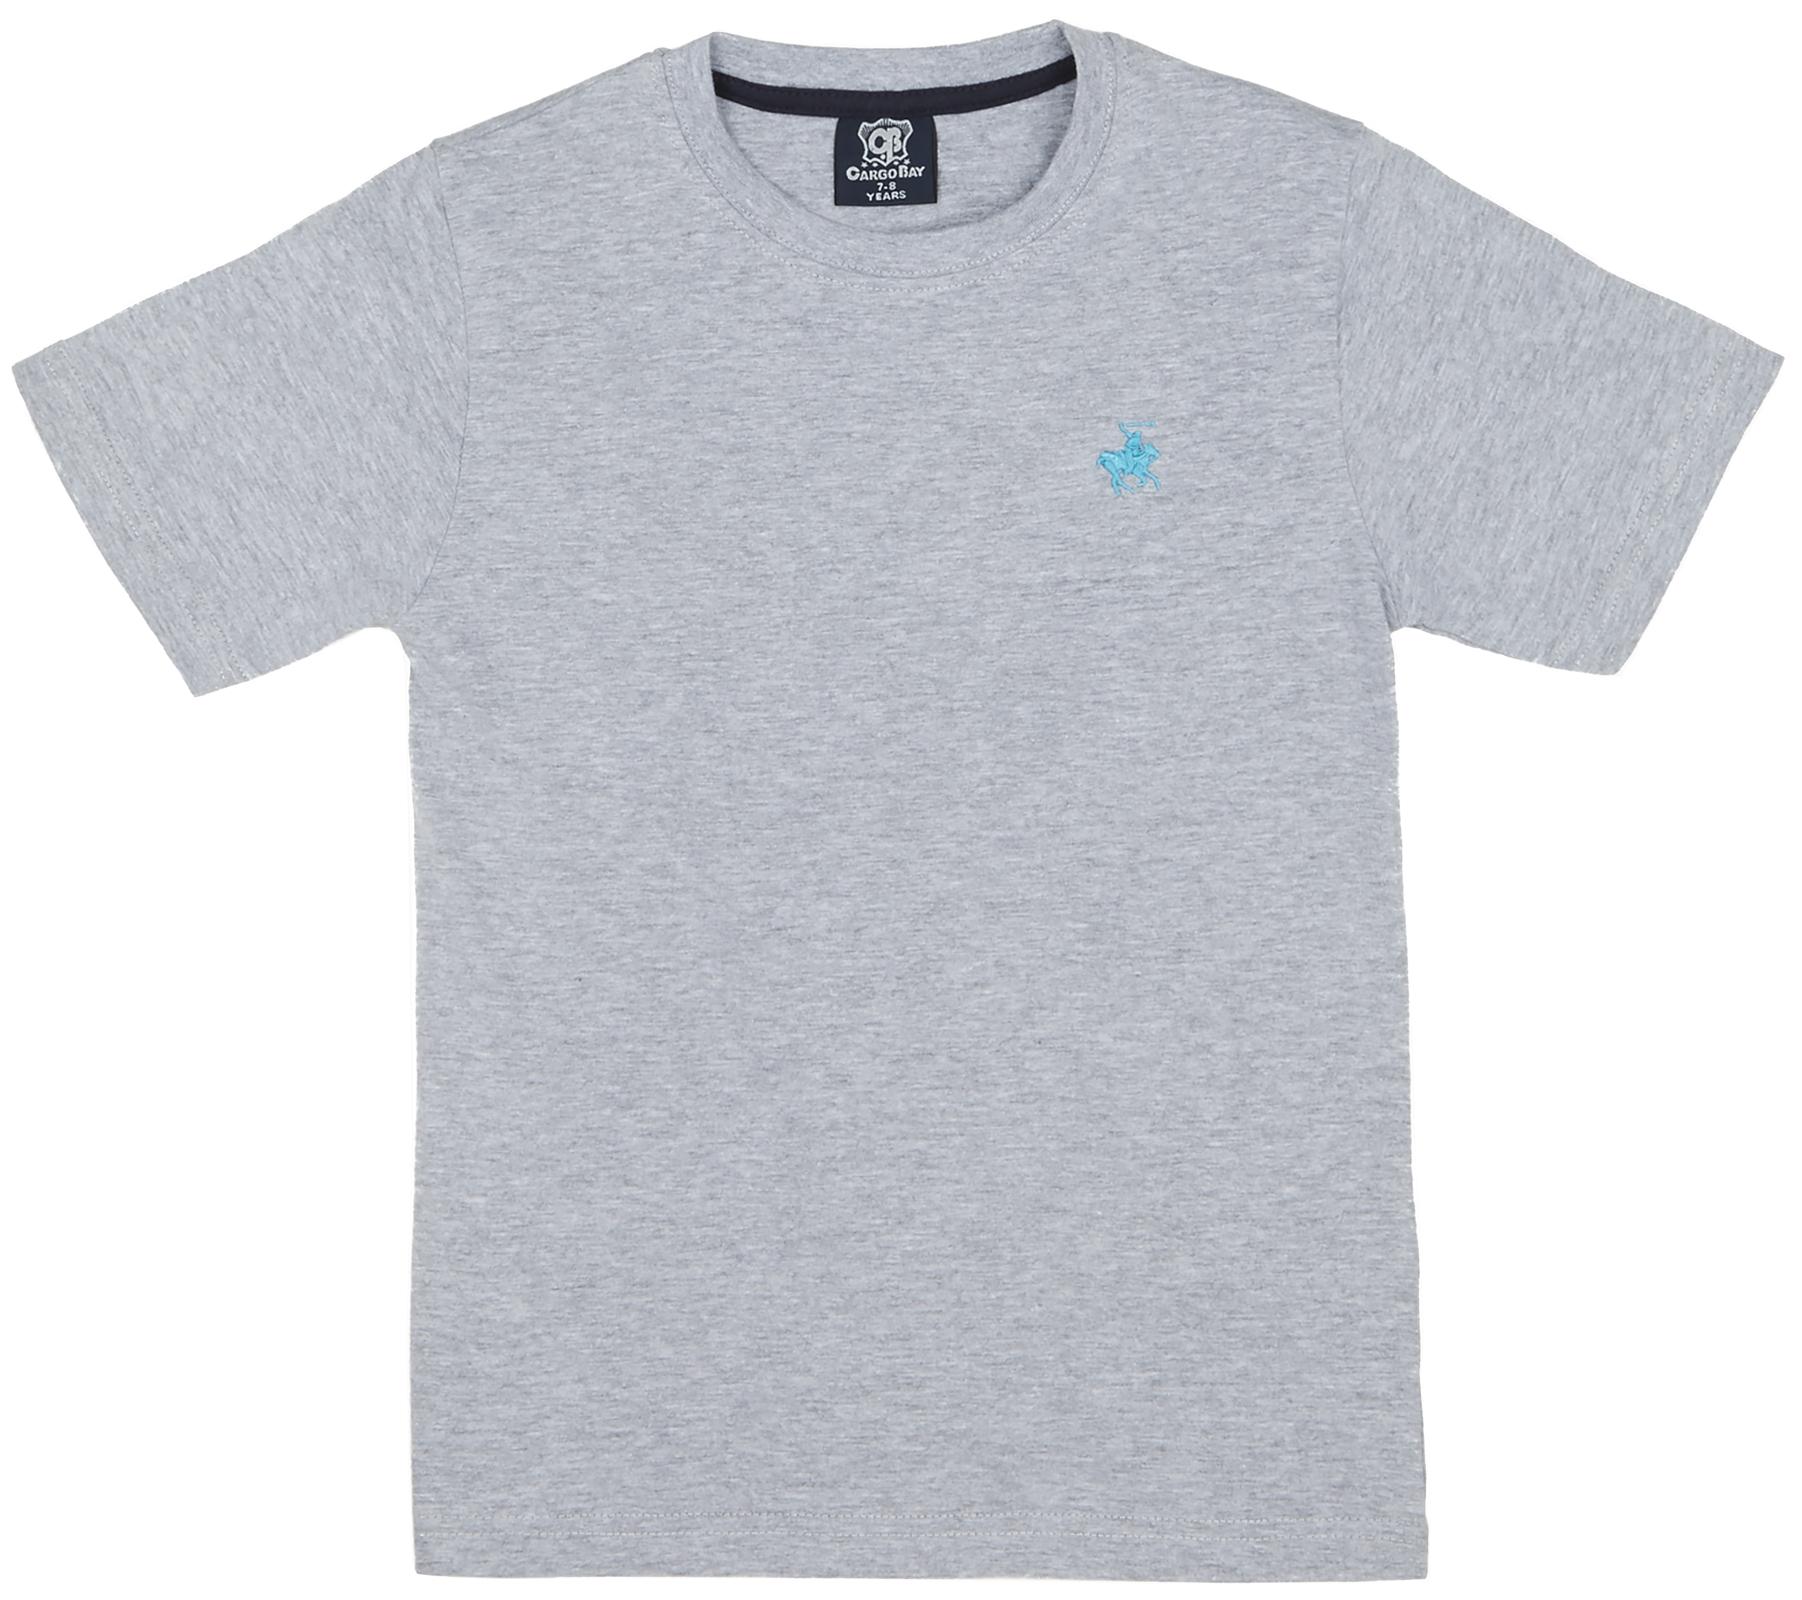 08ba5040c12 Boys Polo Top Or Casual Summer T Shirt Embroidered Logo Short Sleeve ...